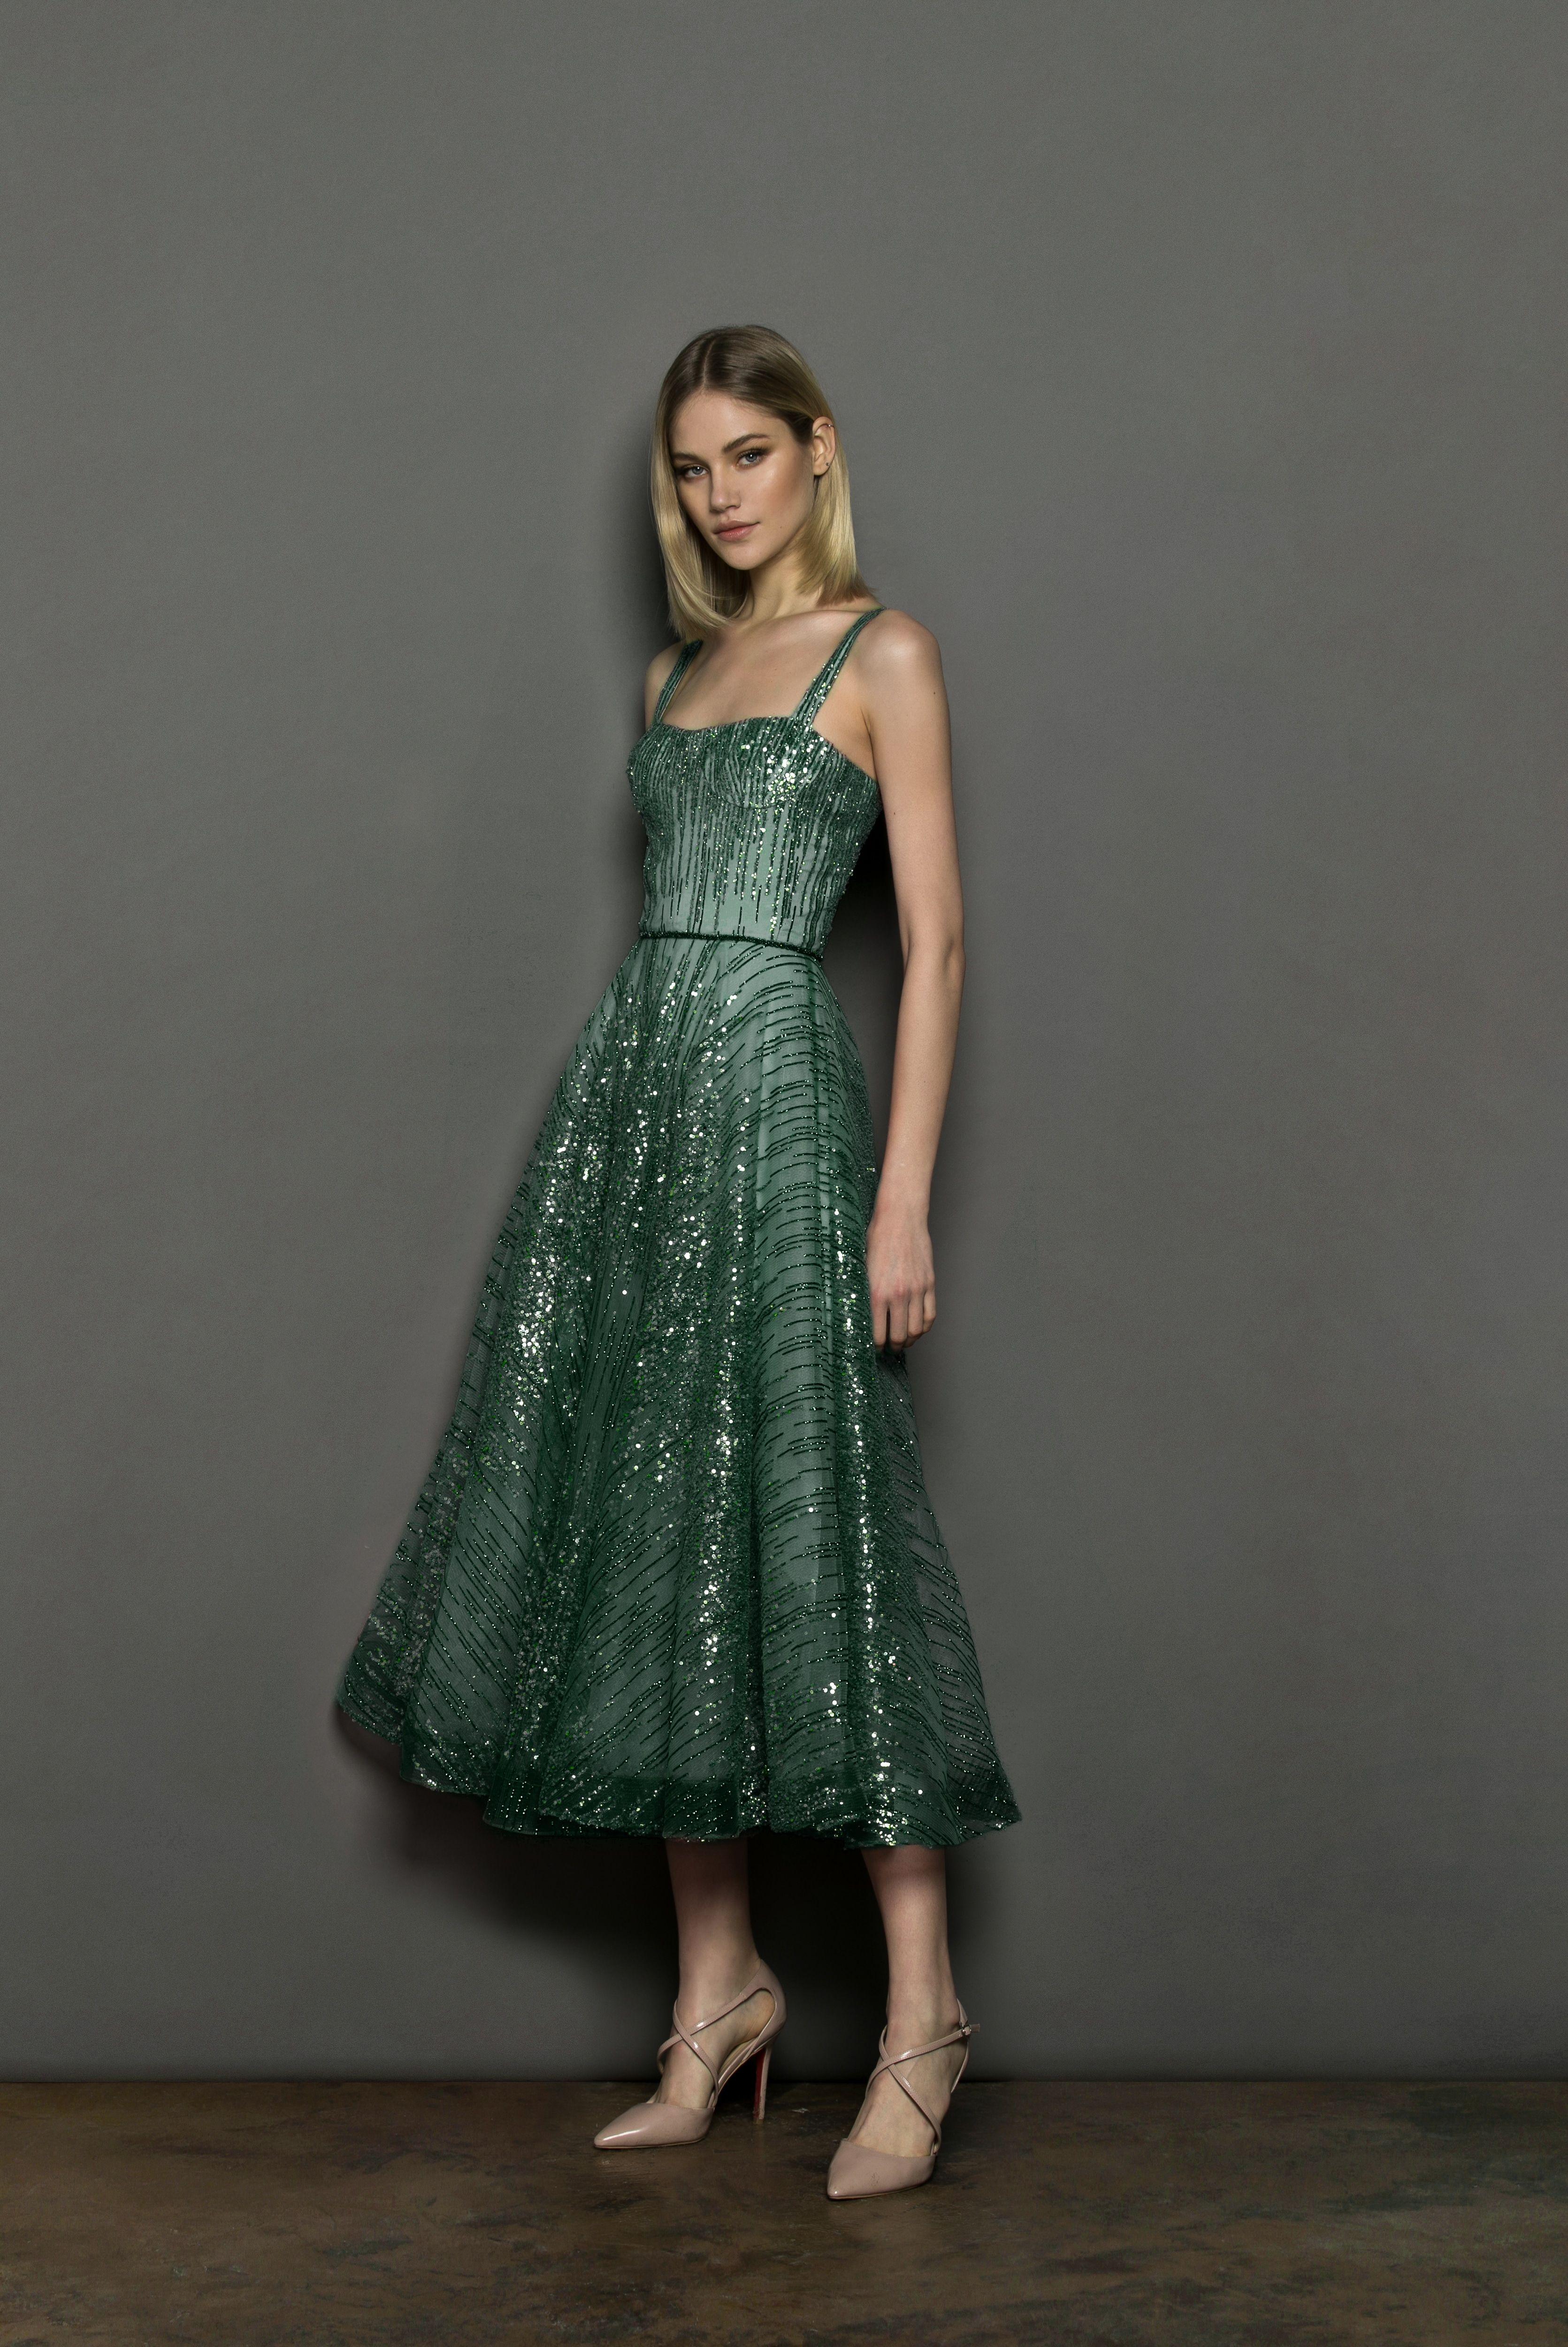 Mademoiselle Midi Dress In Teal Bronx And Banco In 2021 Ball Dresses Dresses Gala Dresses